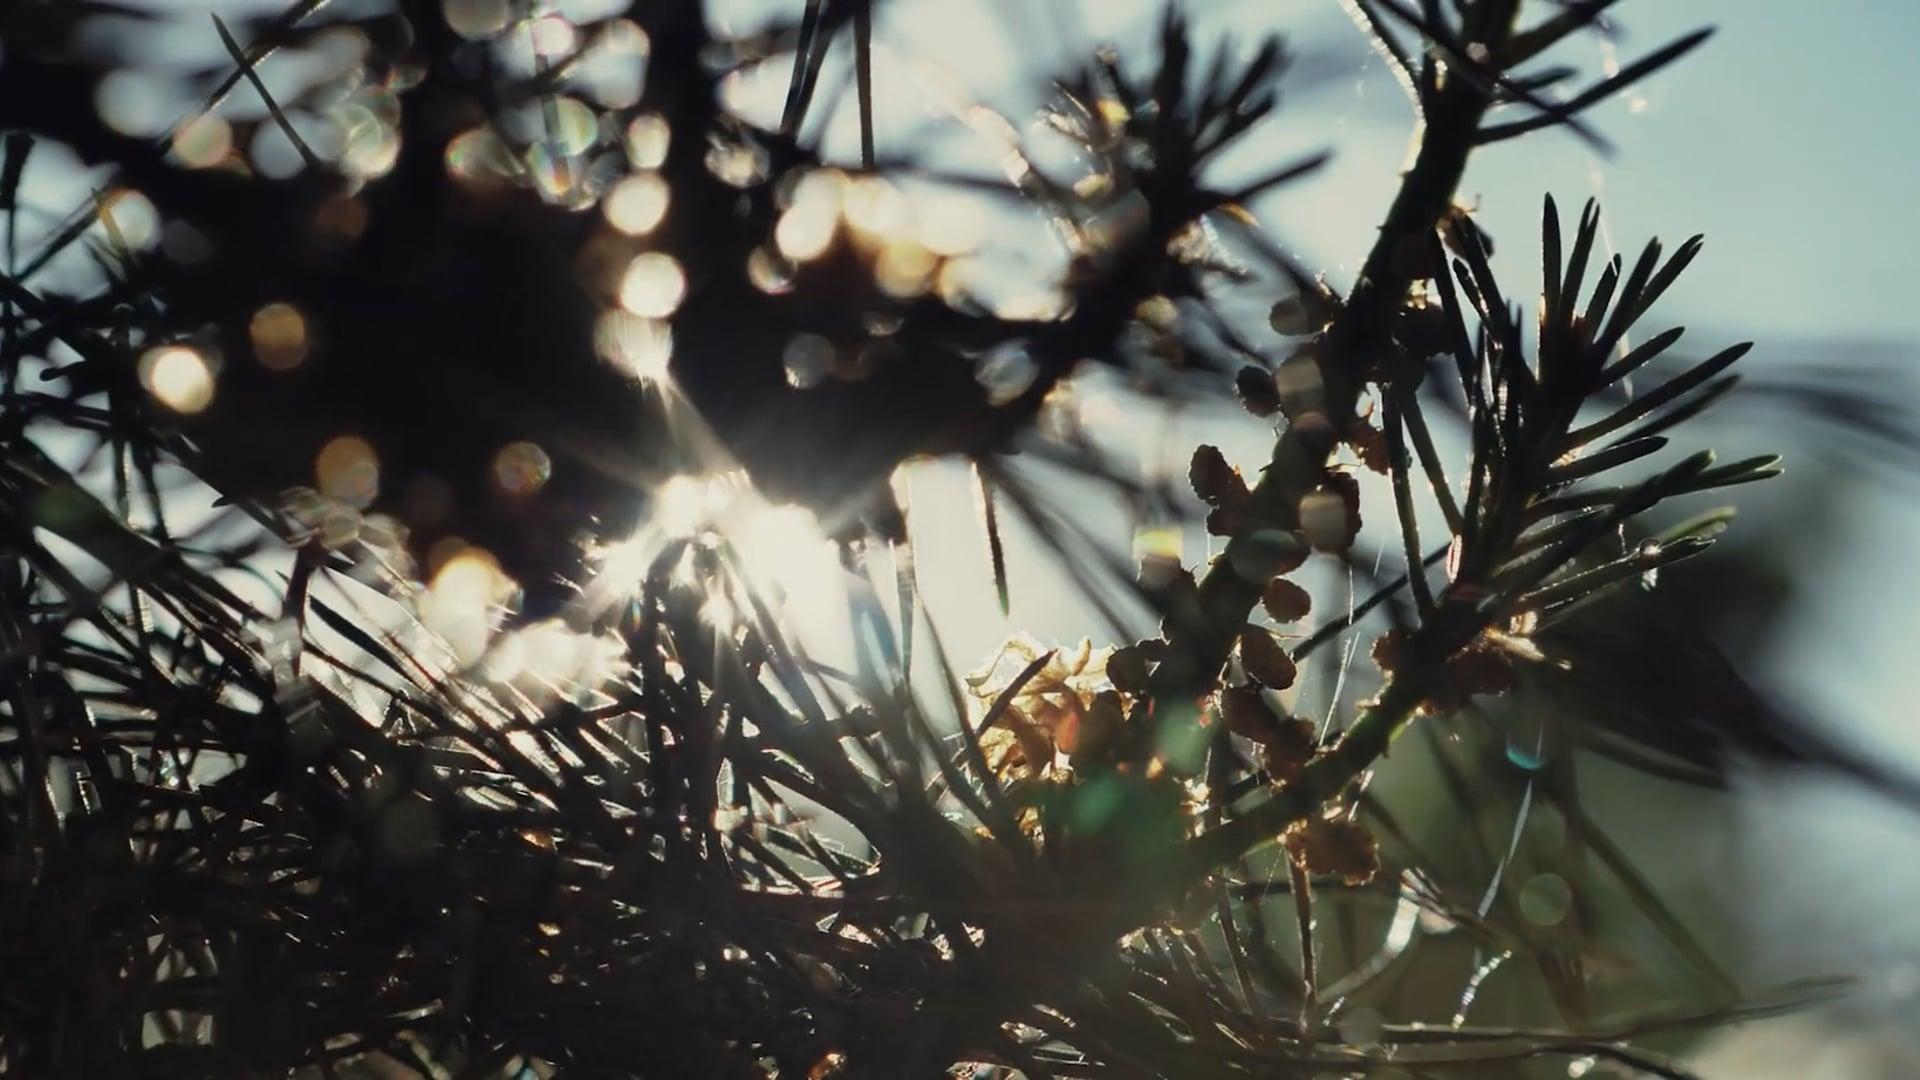 Film Chevalier Paysage - Director's cut